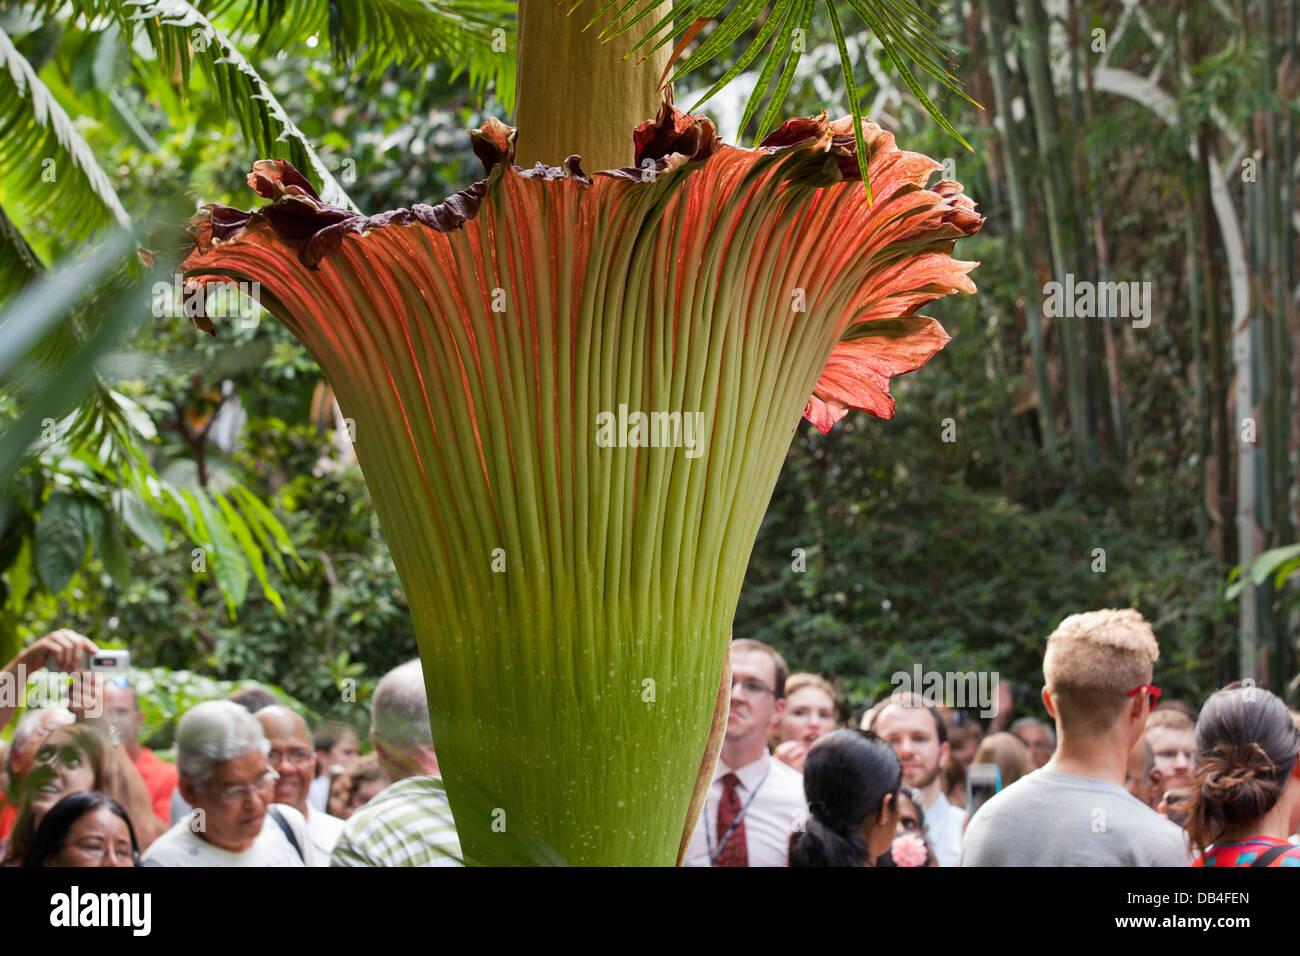 People viewing the rare Corpse flower (Titan Arum) at the US Botanic Garden in Washington, DC - Stock Image